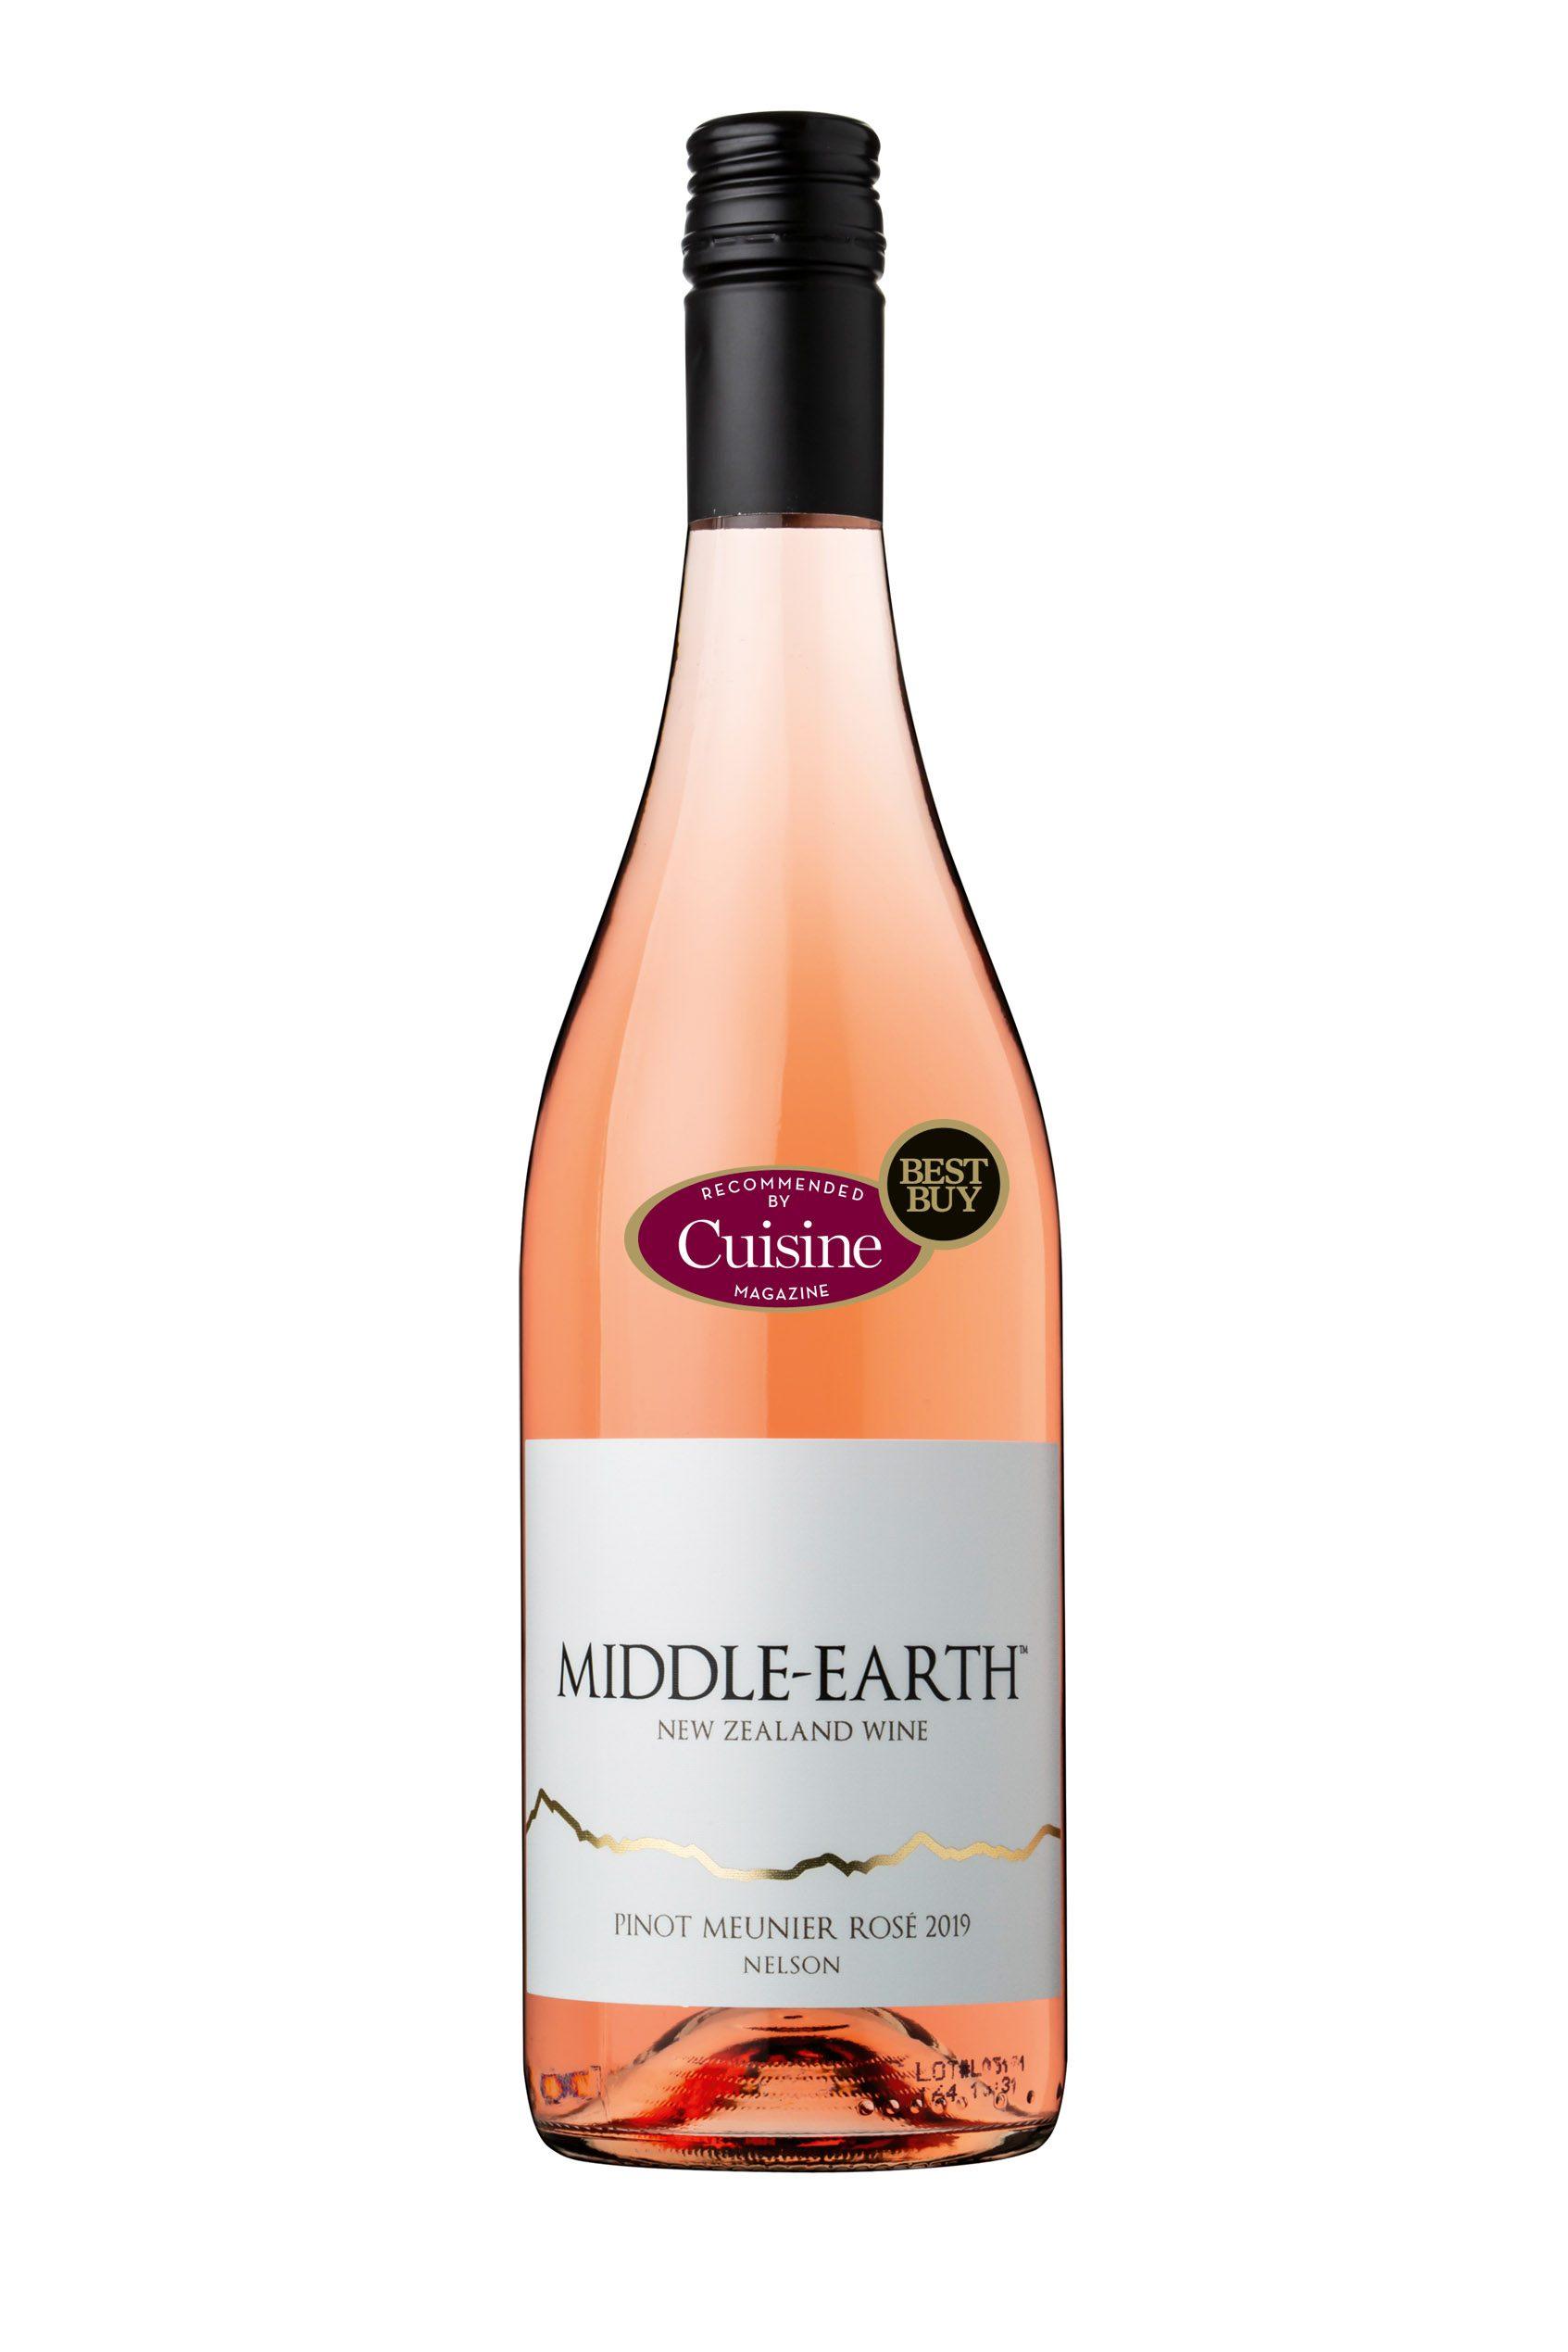 Middle Earth Pinot Meunier Rosé 2019 (Nelson)